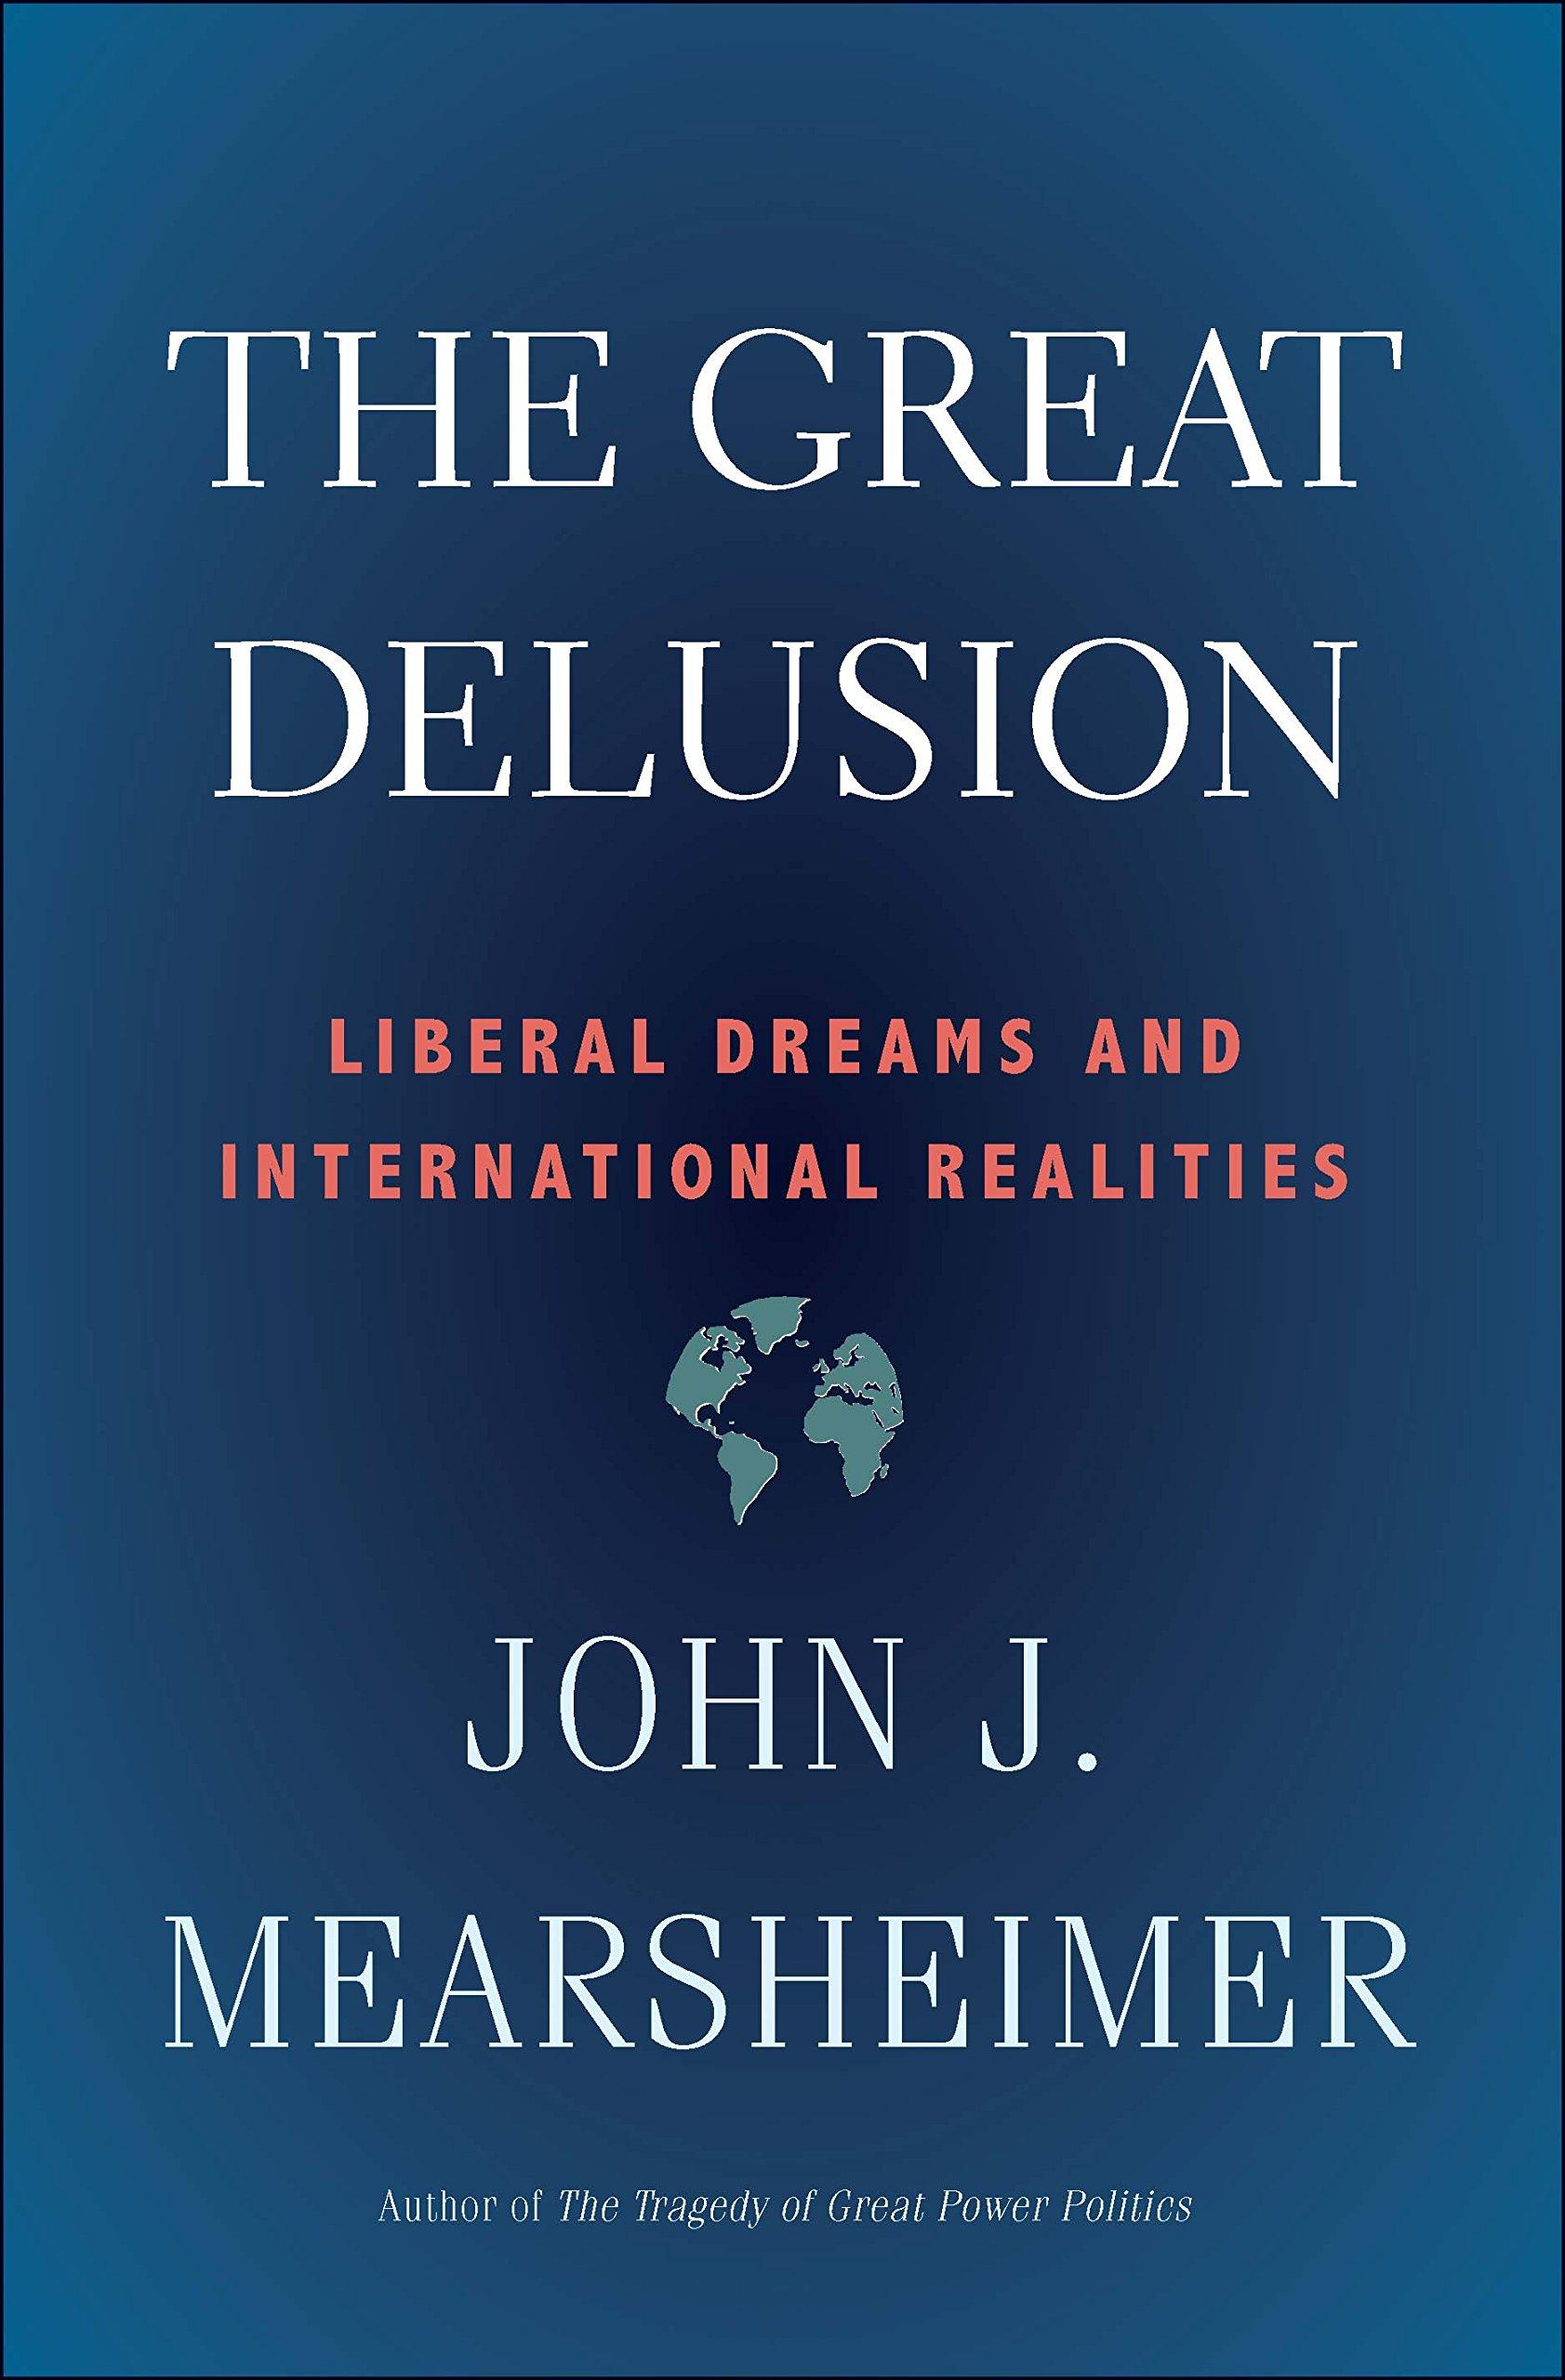 The Great Delusion Liberal Dreams and International Realities John